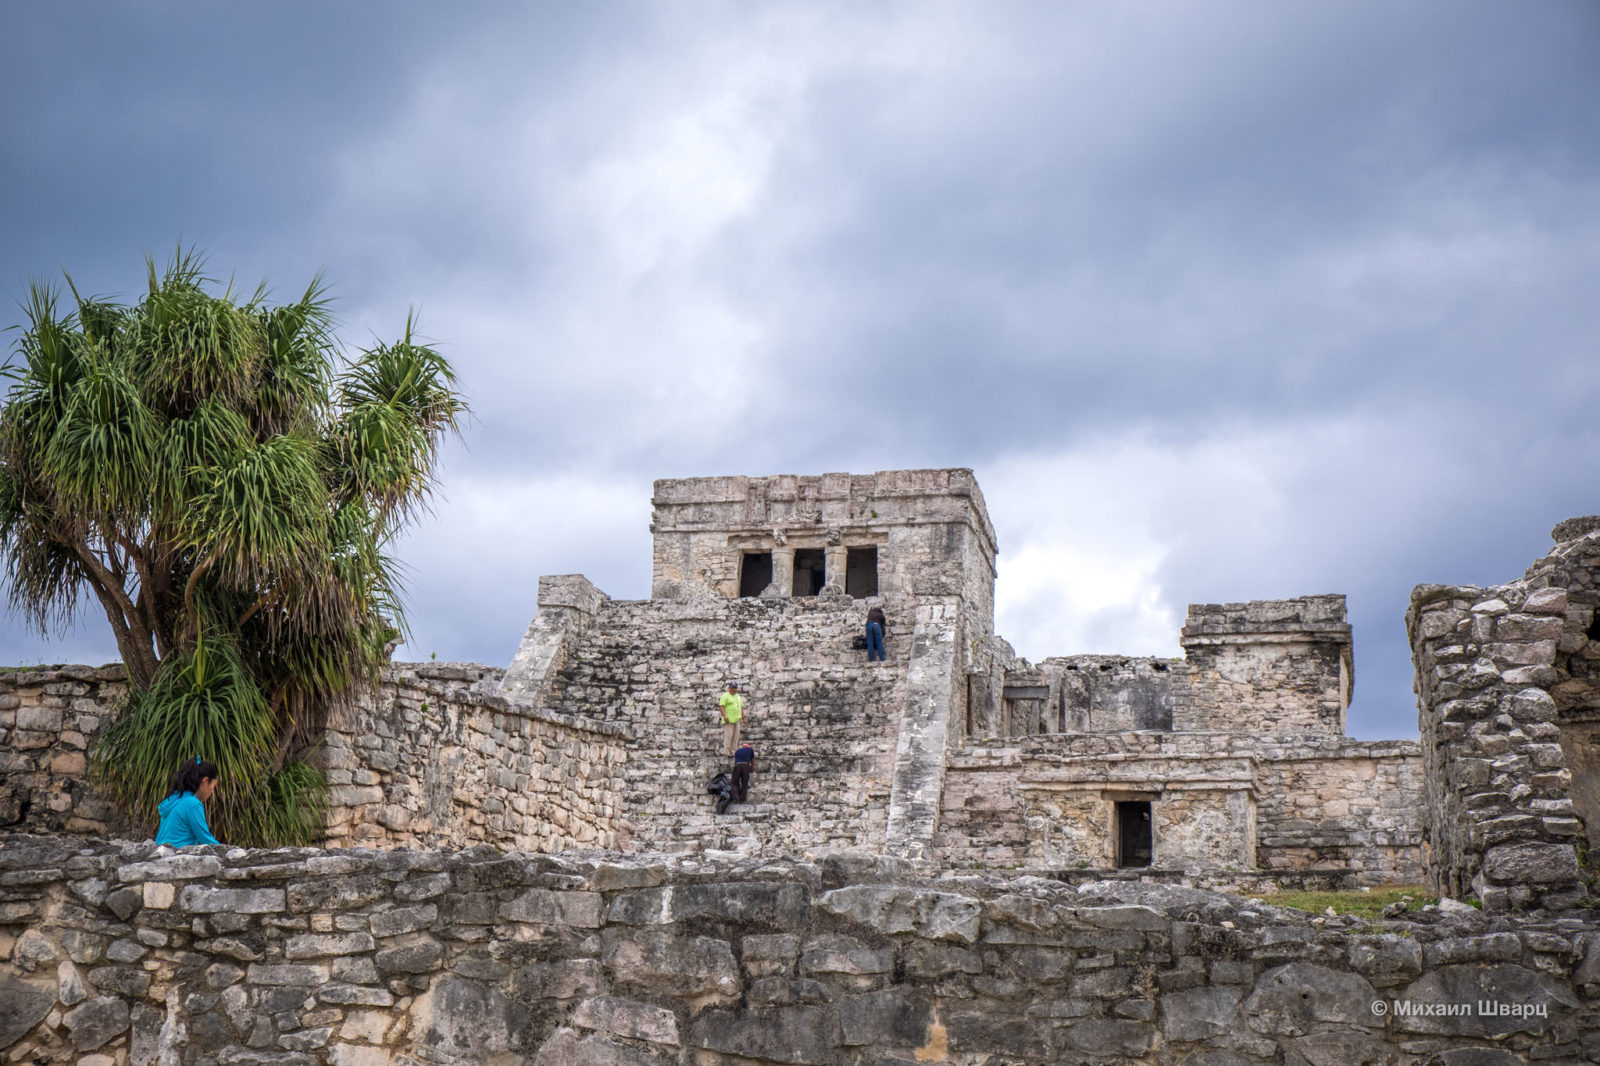 El Castillo Замок